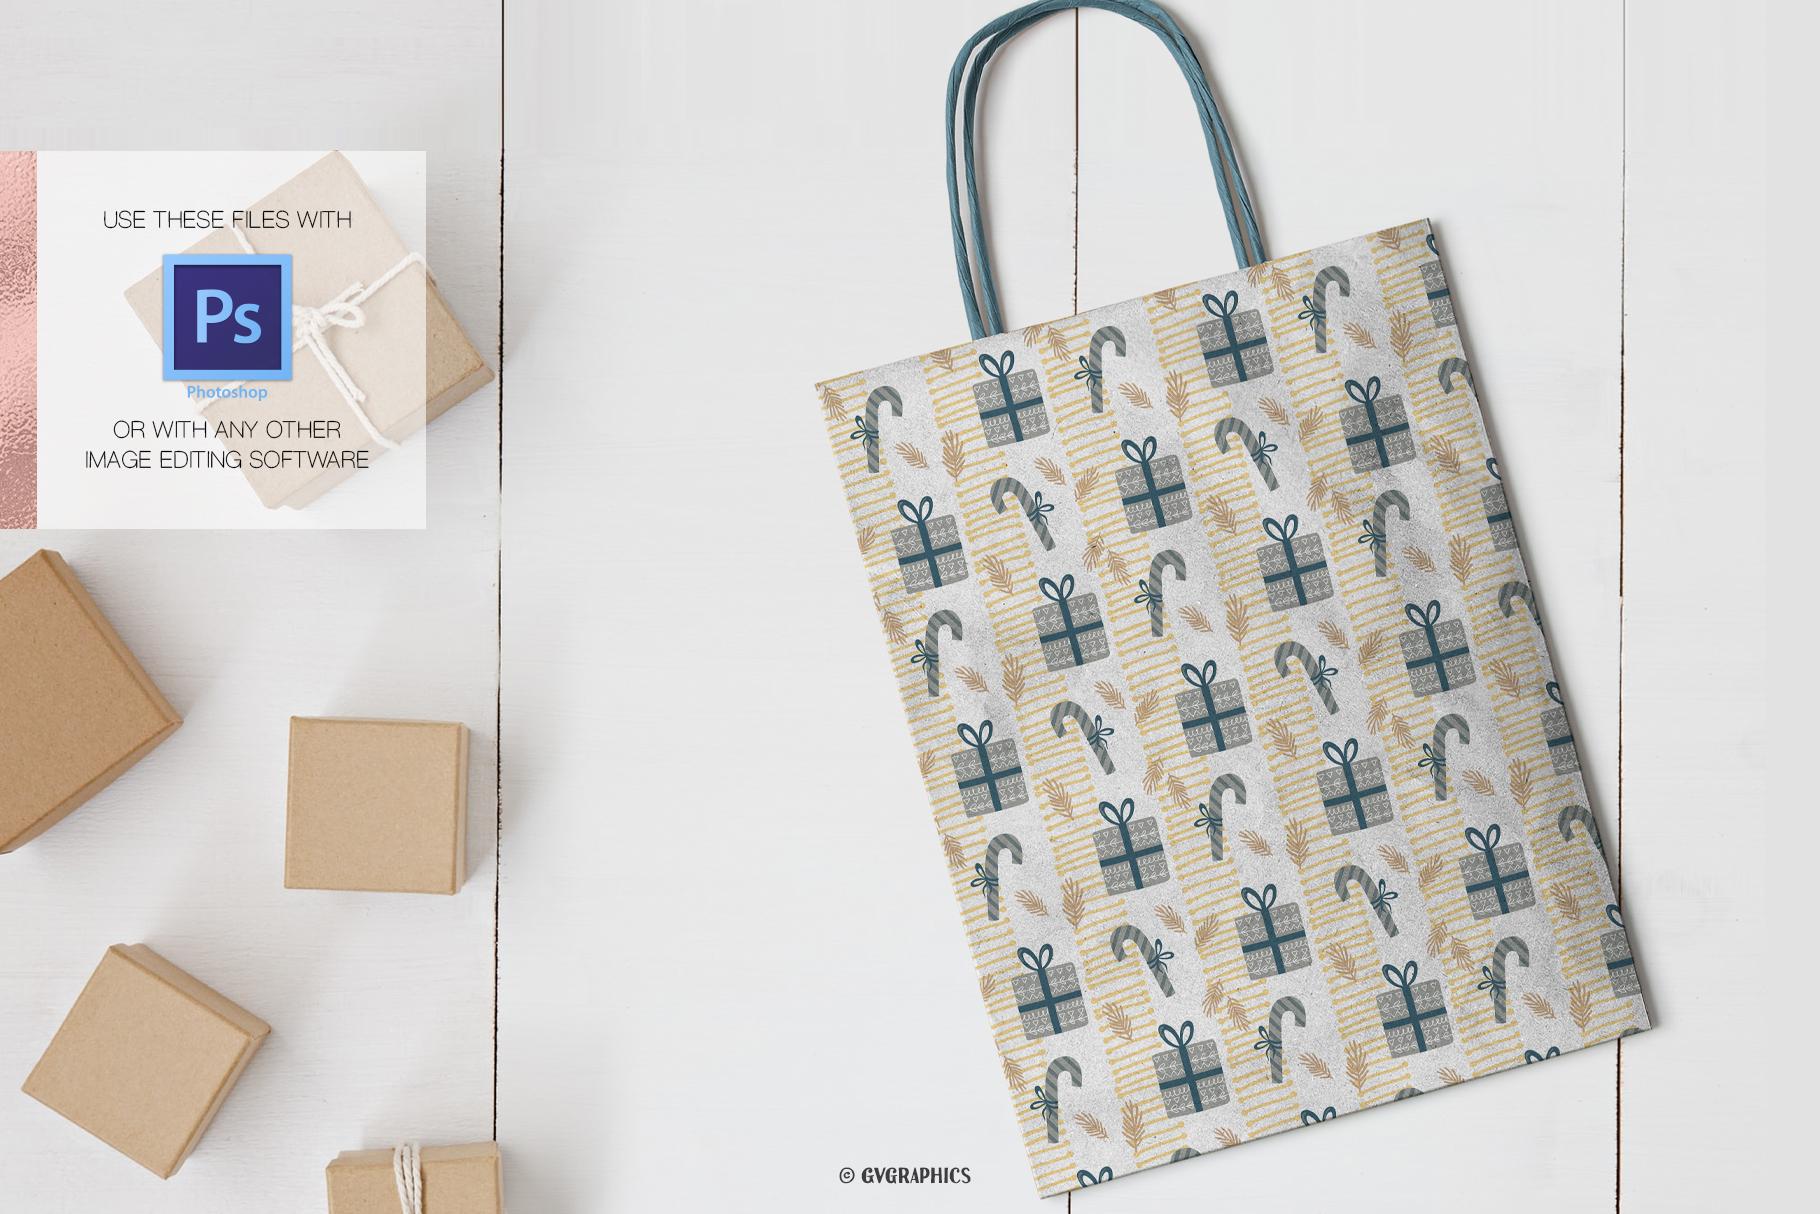 Peper Greeting Bag Made On The Basis Christmas Seamless Patterns.